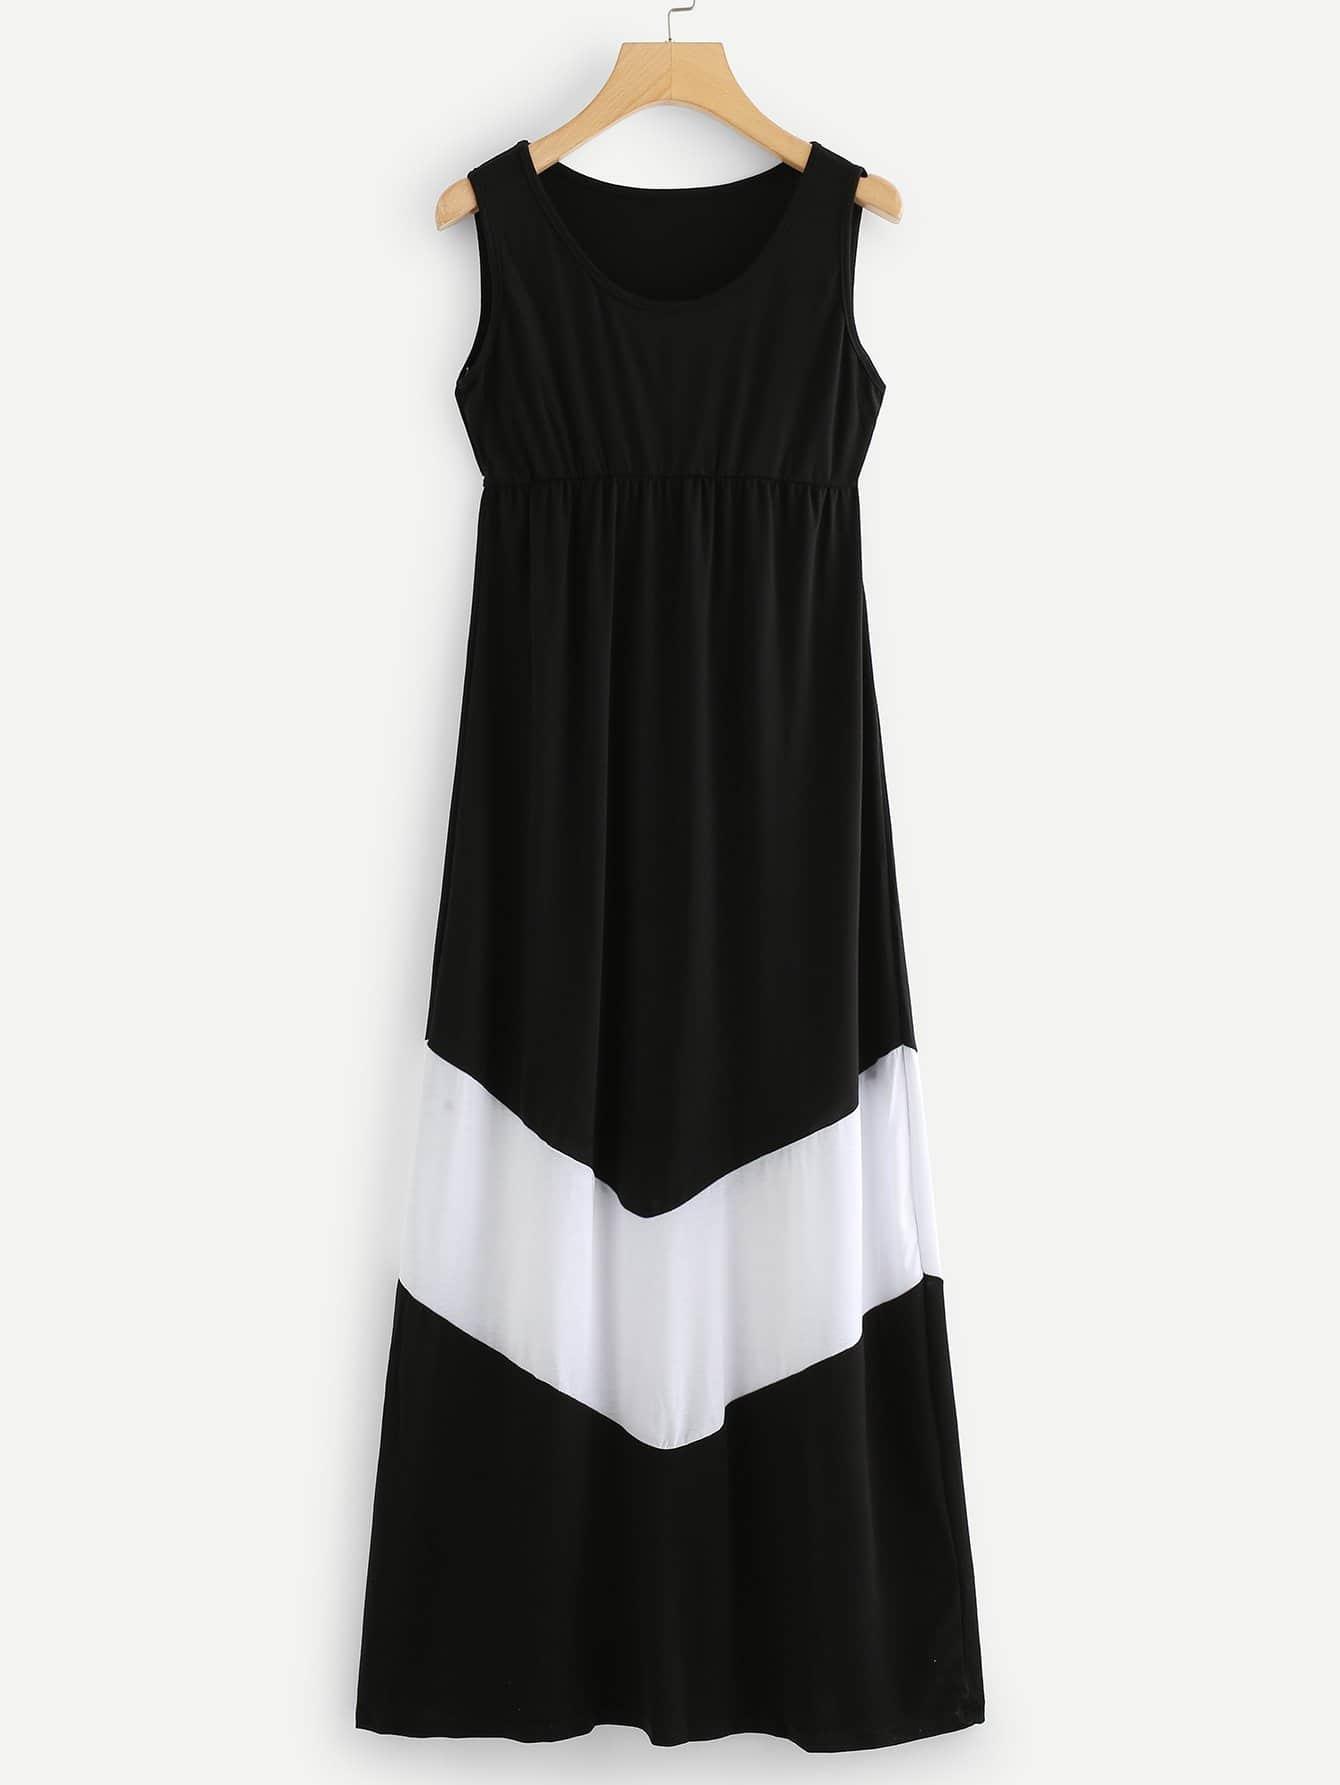 Contrast Panel Dress contrast panel asymmetrical casual dress long